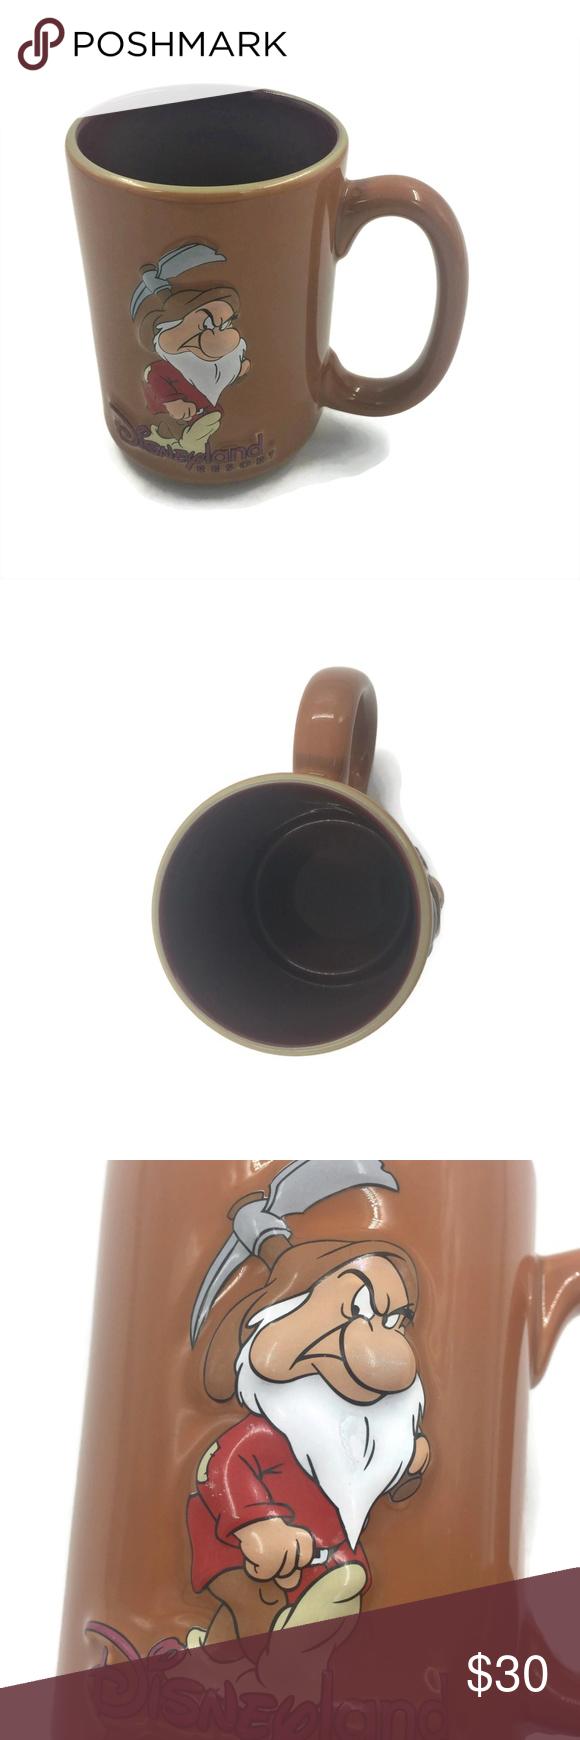 Disney Grumpy Dwarf 3D Coffee Mug Disney Grumpy Dwarf 3D Coffee Brown Mug Disneyland Resort Cup Snow White Disney Kitchen Coffee & Tea Accessories #disneycoffeemugs